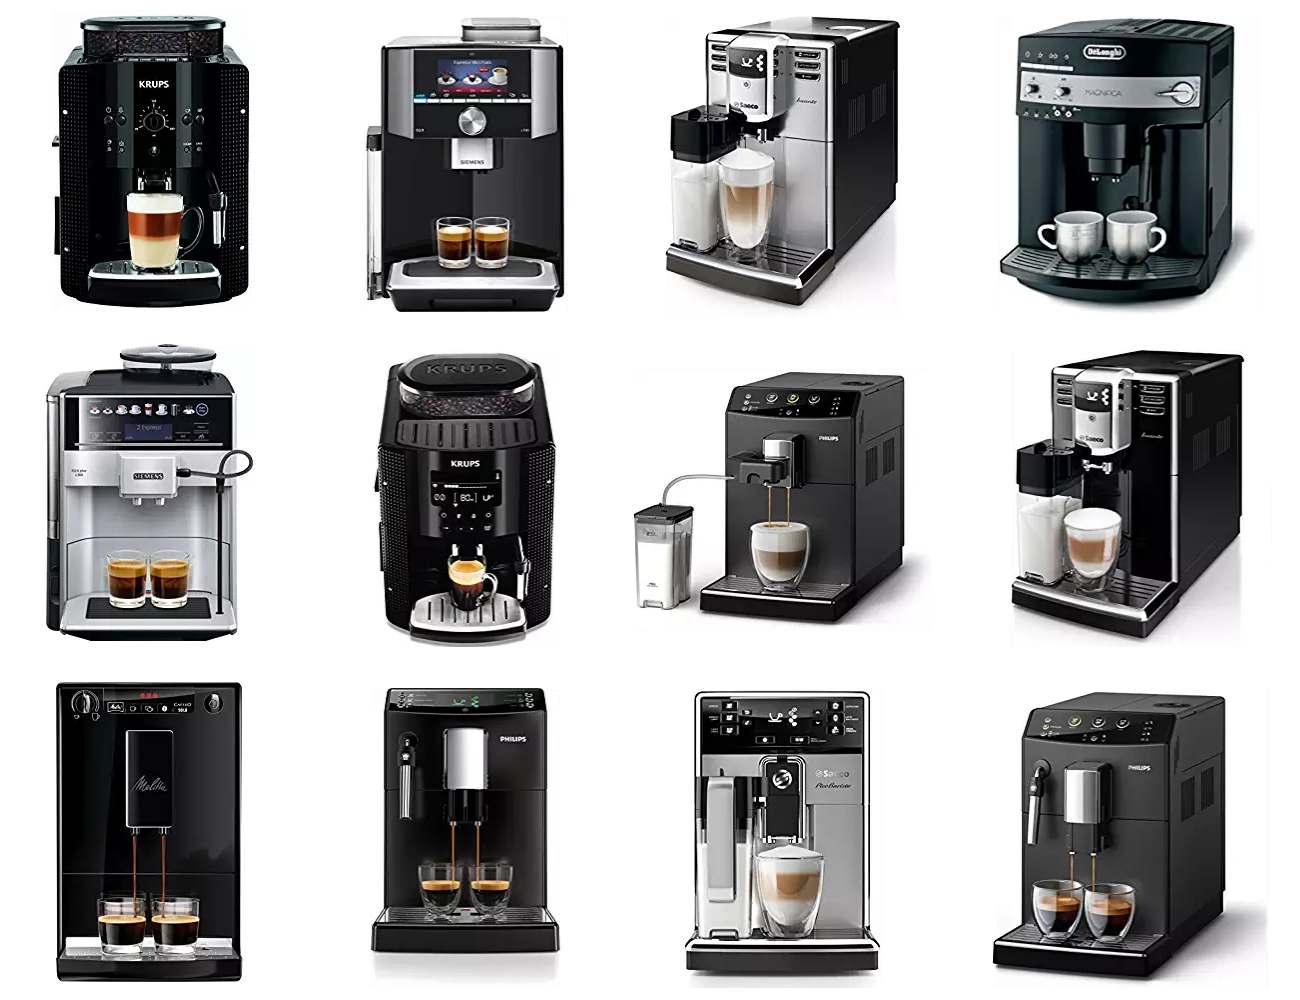 Melitta 180424 Permanent Kaffeefilter 2 Stück für alle Philips Senseo Kaffeepa